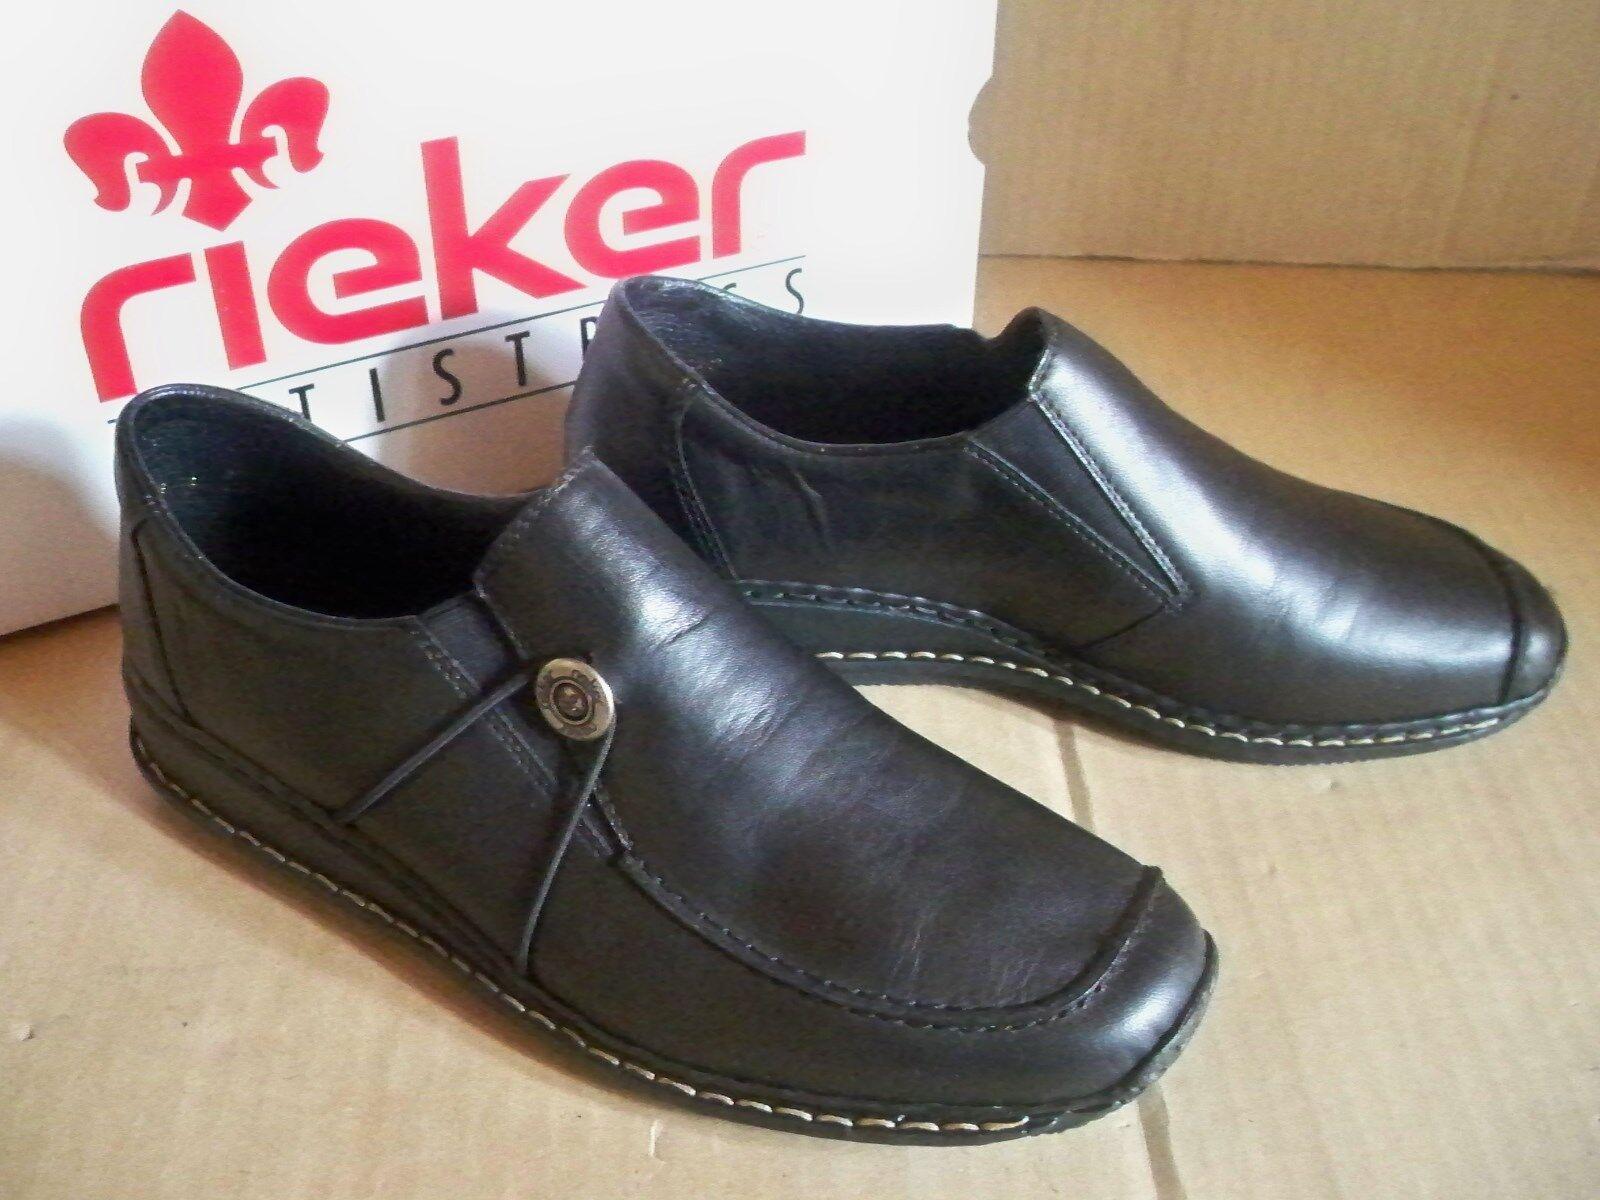 rieker BNTISTRESS   Slipper schwarz Leder 44381-00